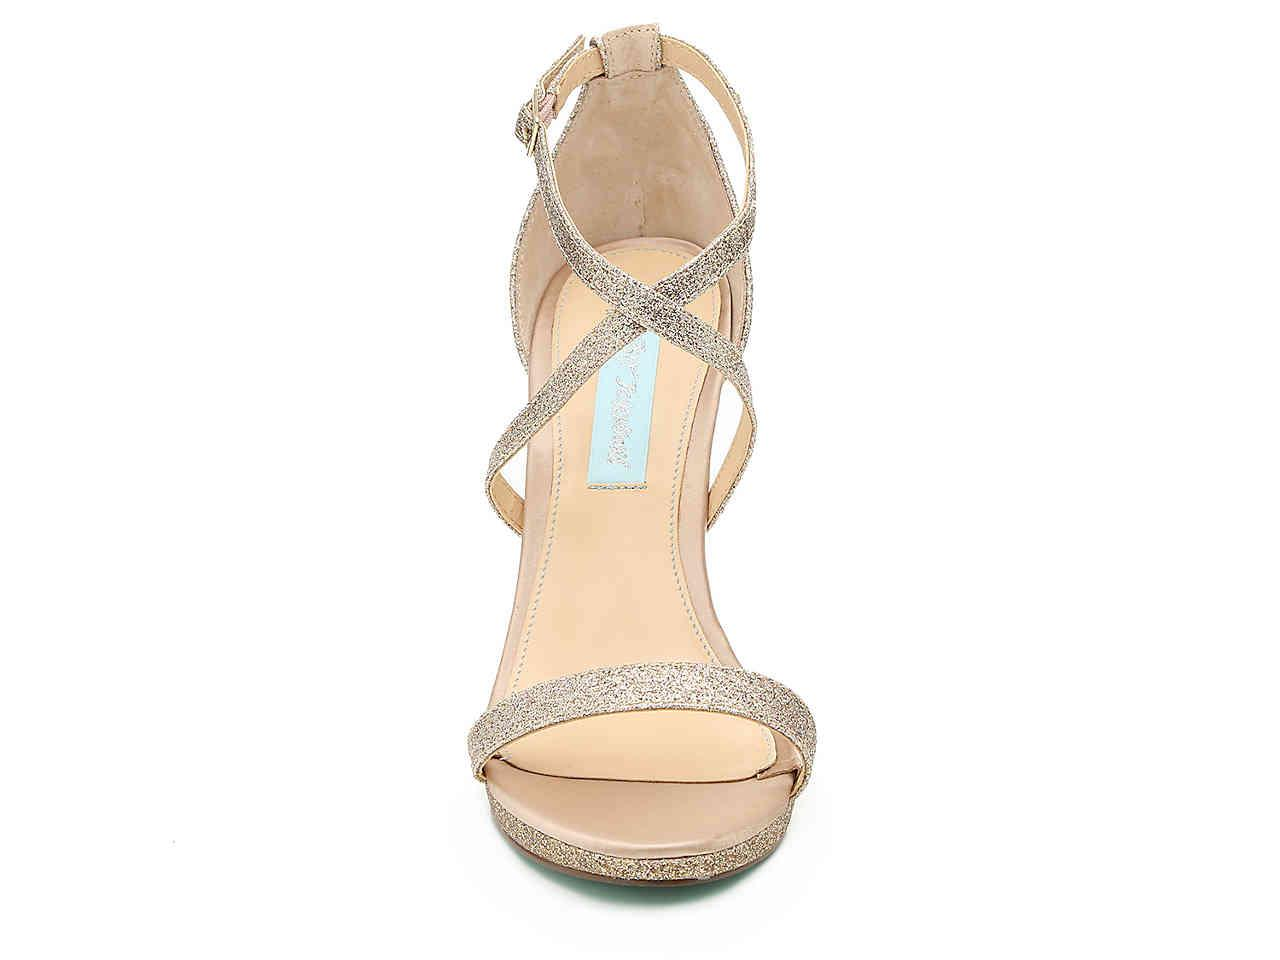 Betsey Johnson Dina Platform Sandal in